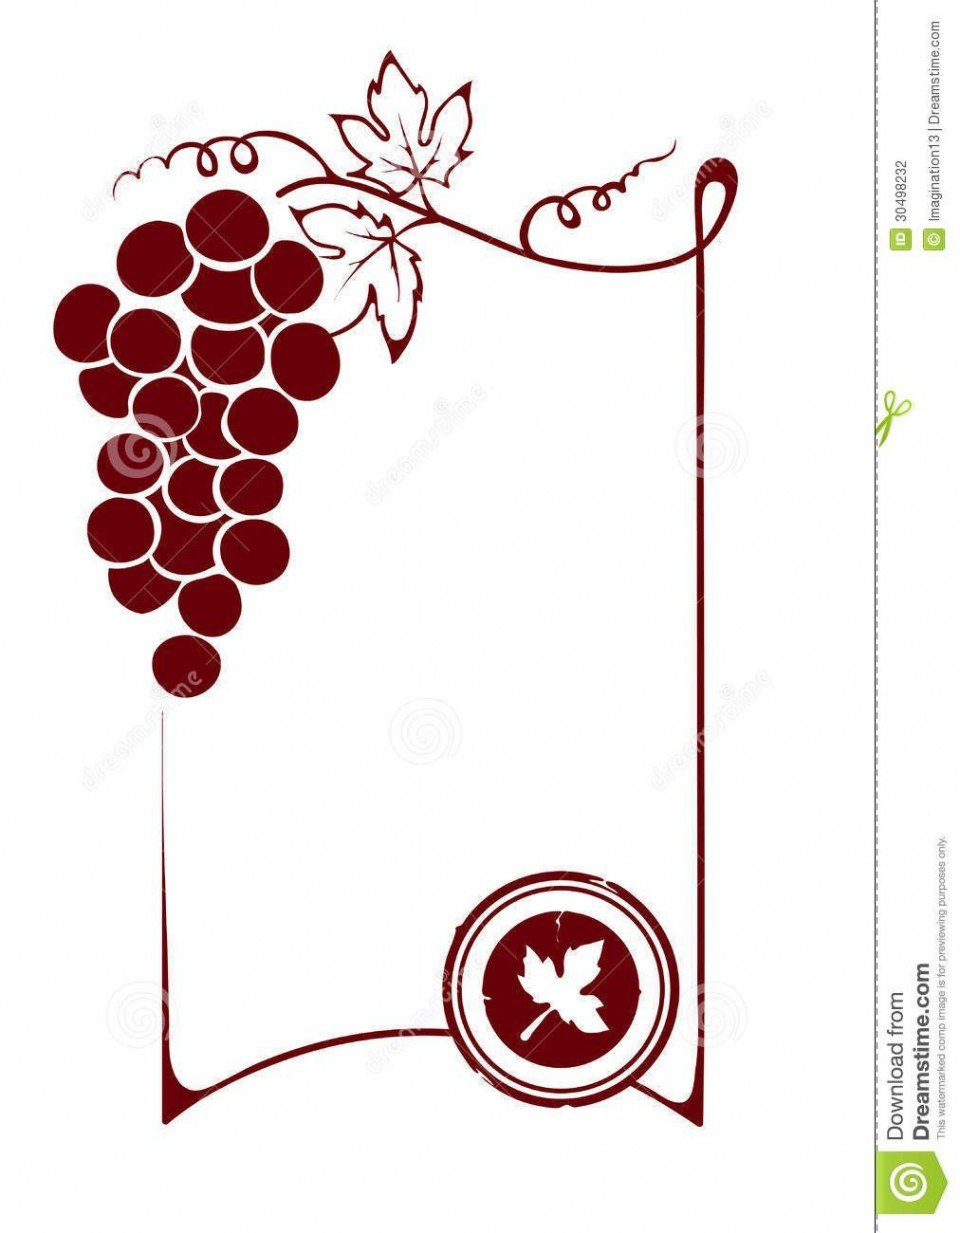 004 Imposing Free Wine Label Template Idea  Bottle Microsoft Word Online Psd960